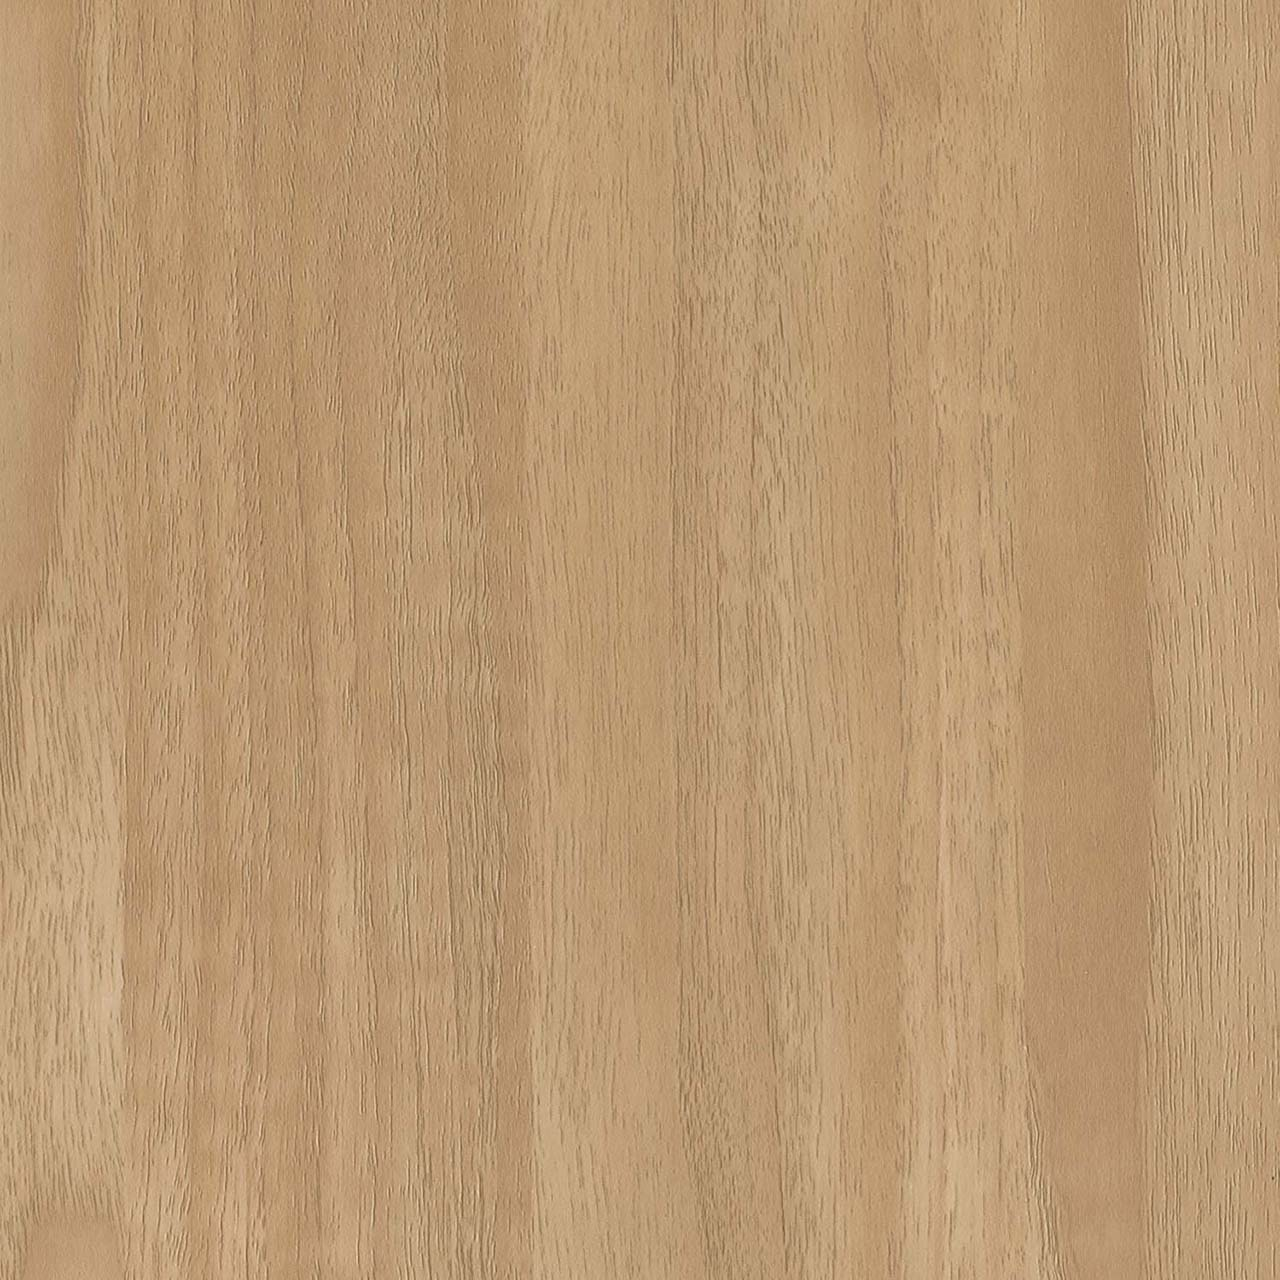 Stilo Walnut effect laminate panel